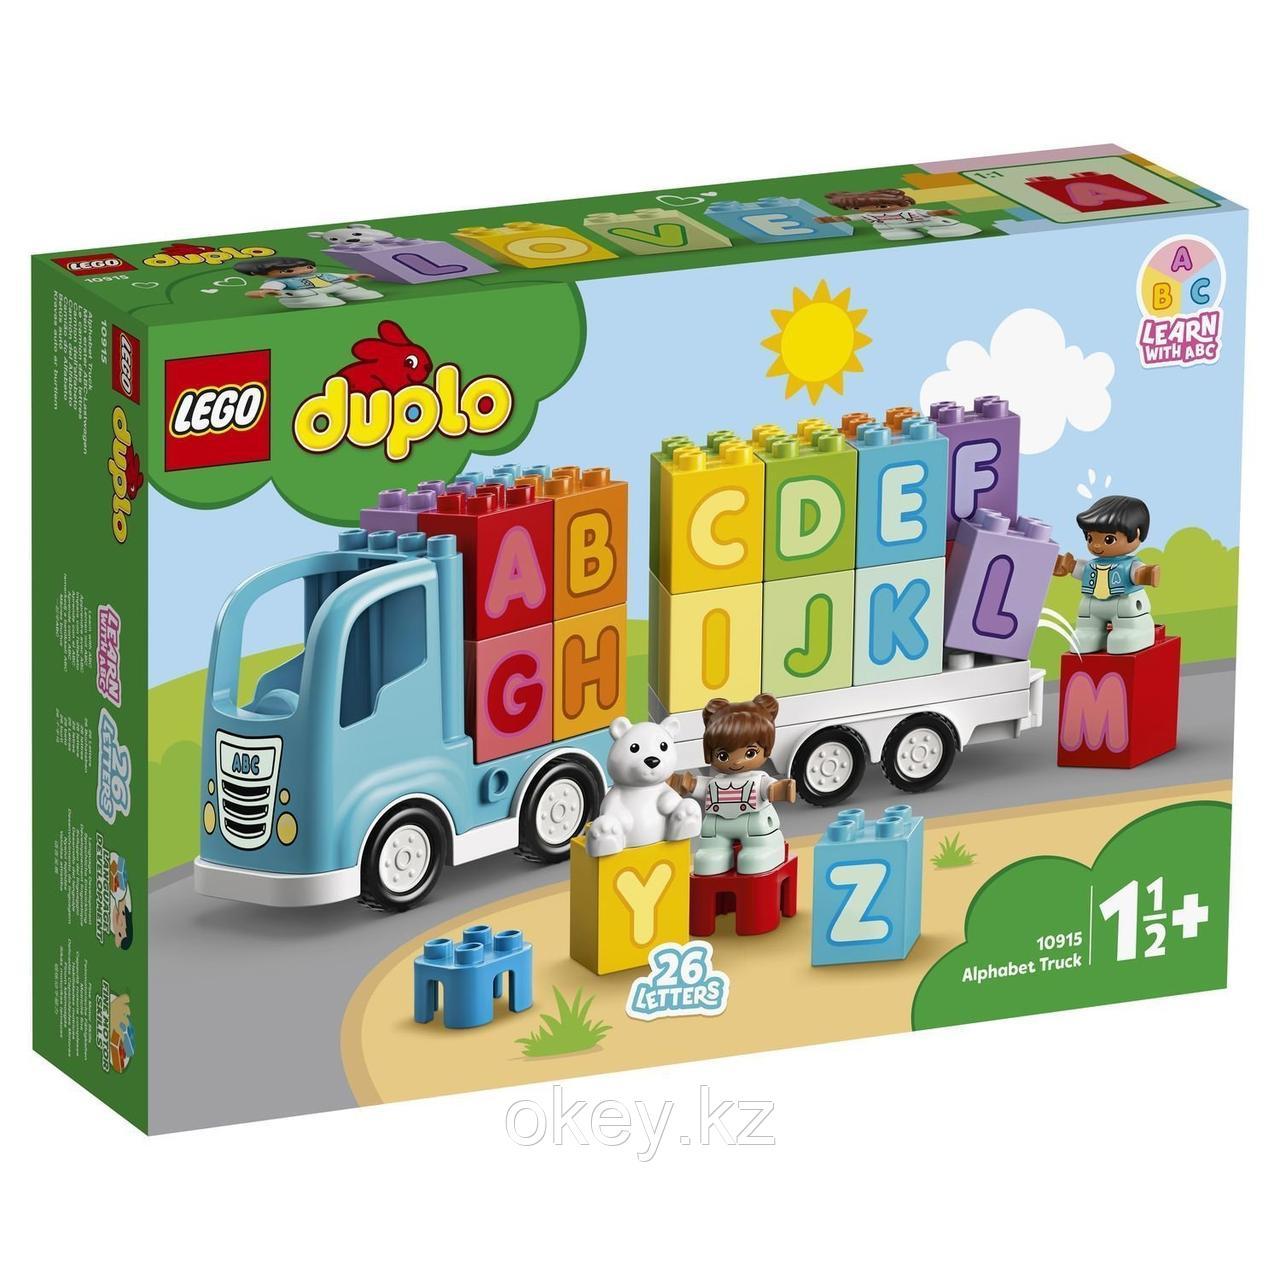 LEGO Duplo: Грузовик Алфавит 10915